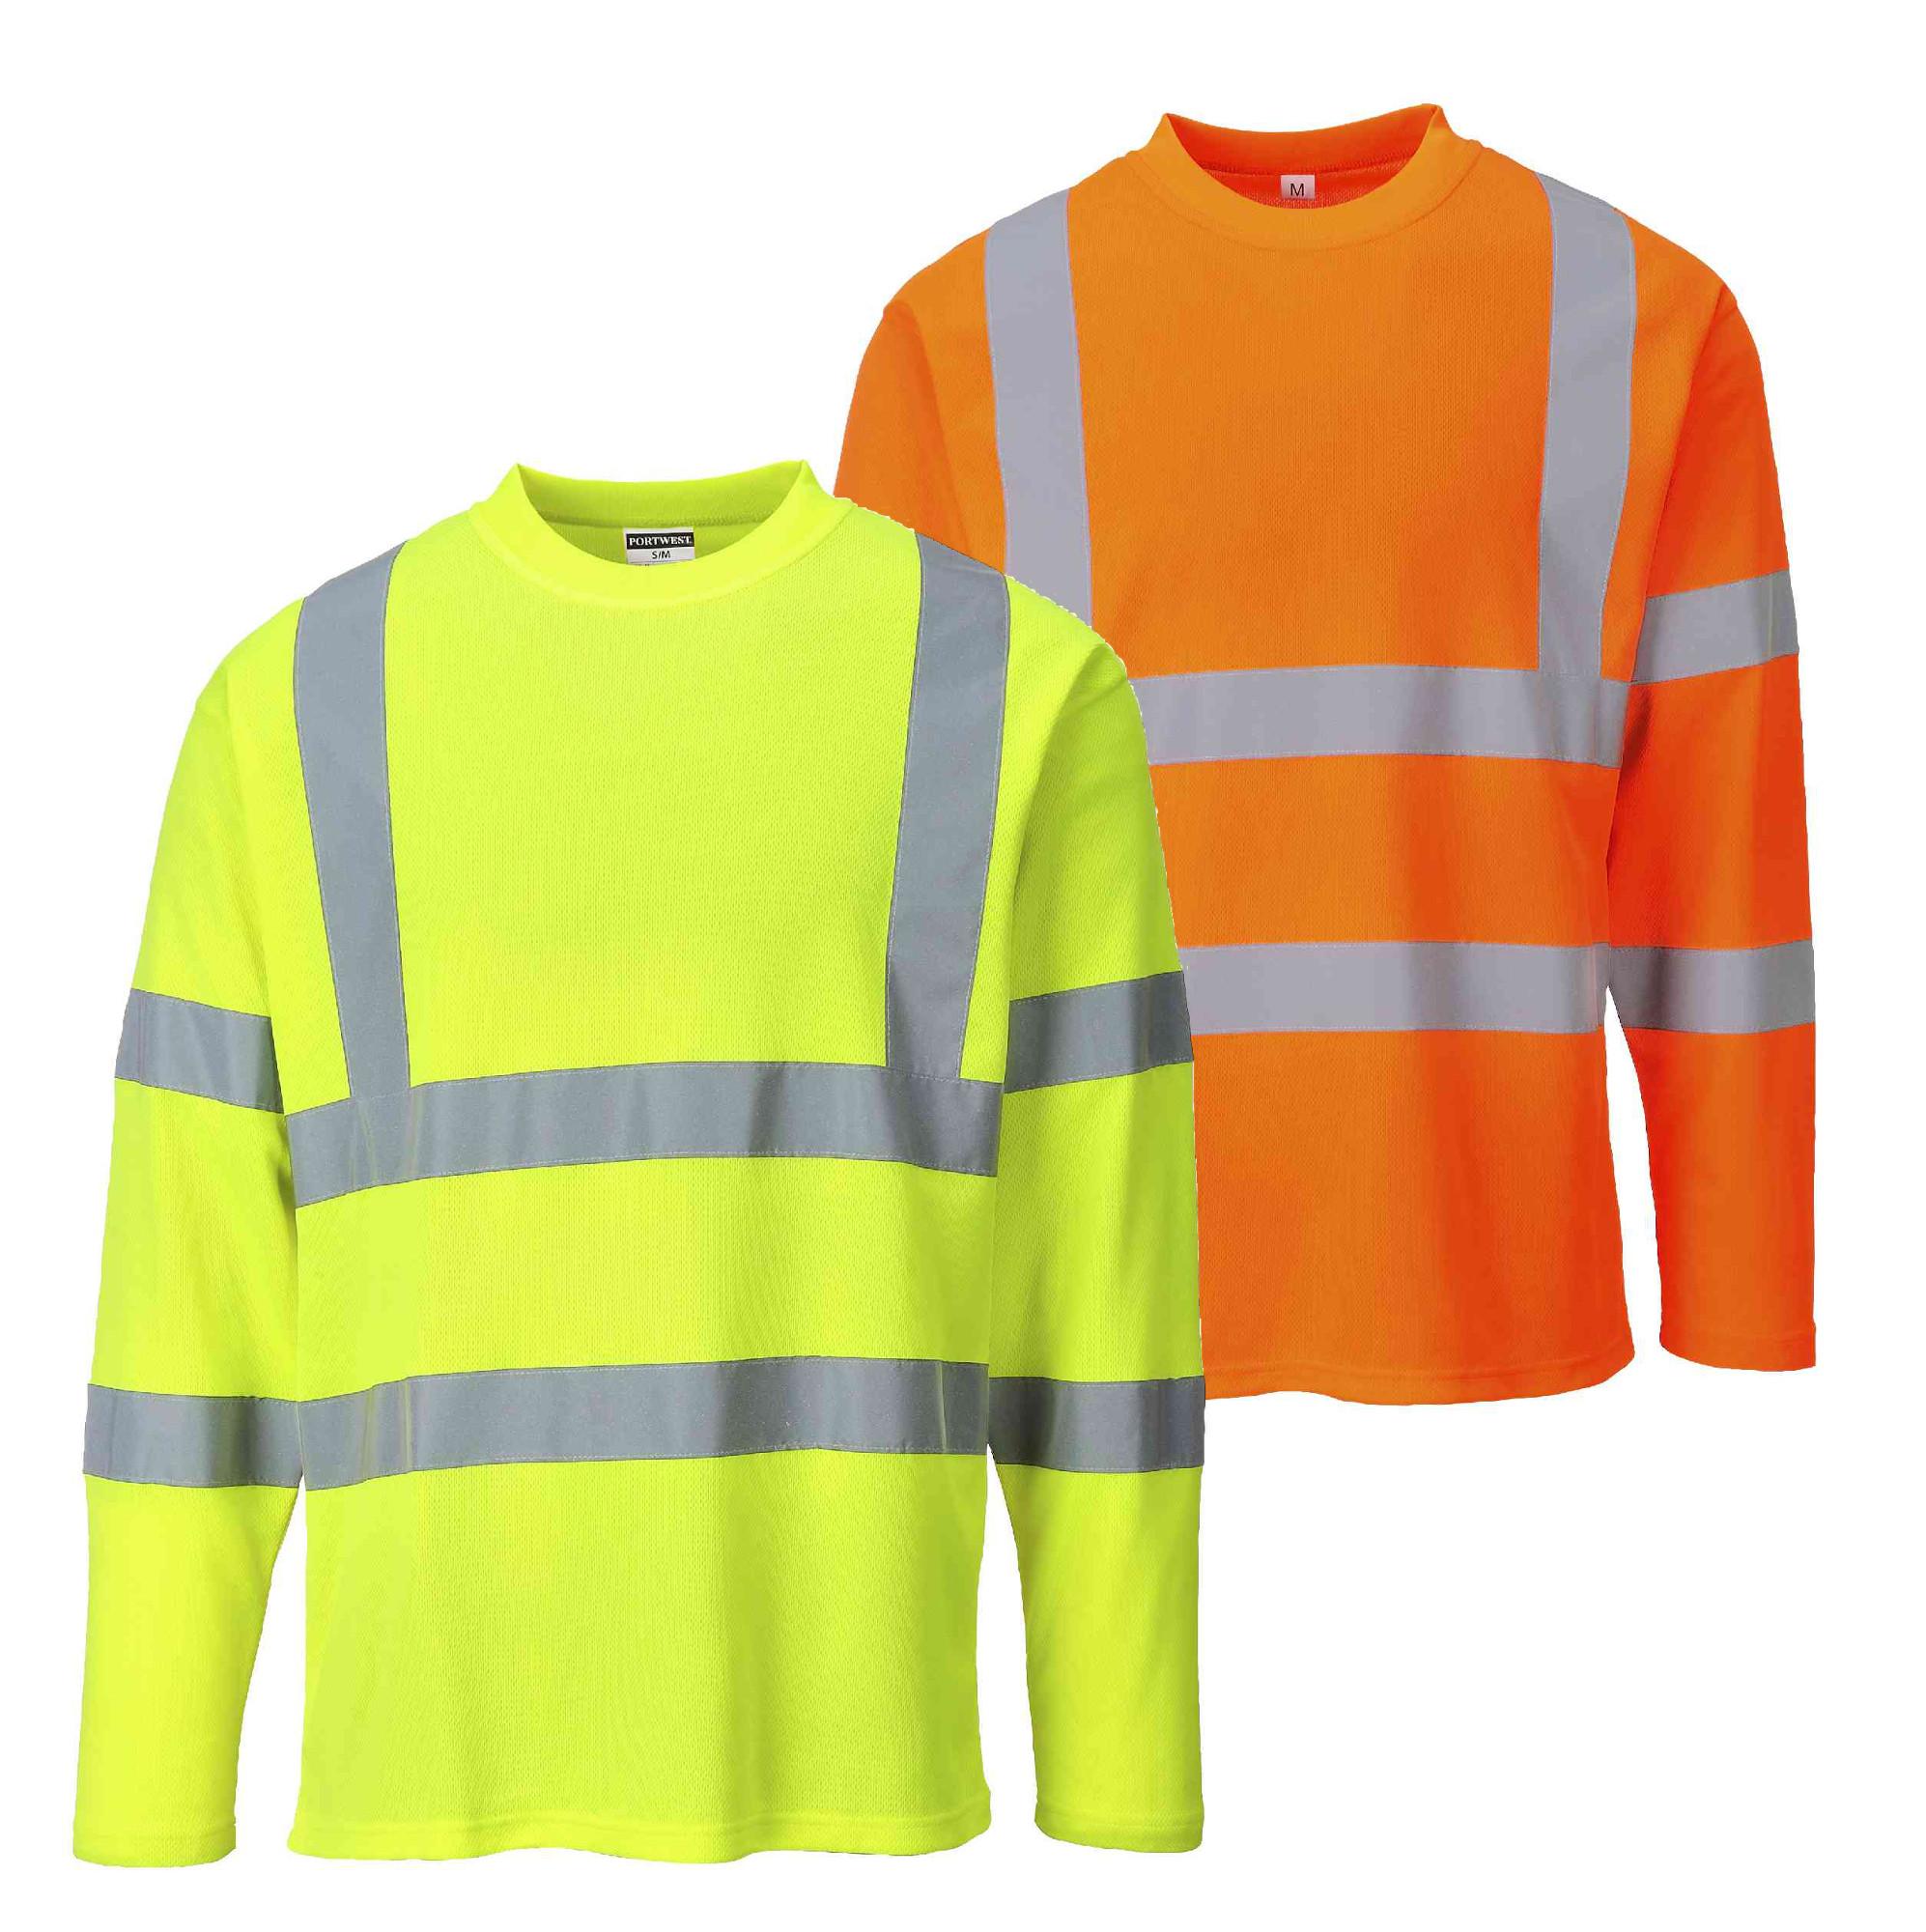 Portwest S278 Hi Vis T-Shirt eb6f3f6bd